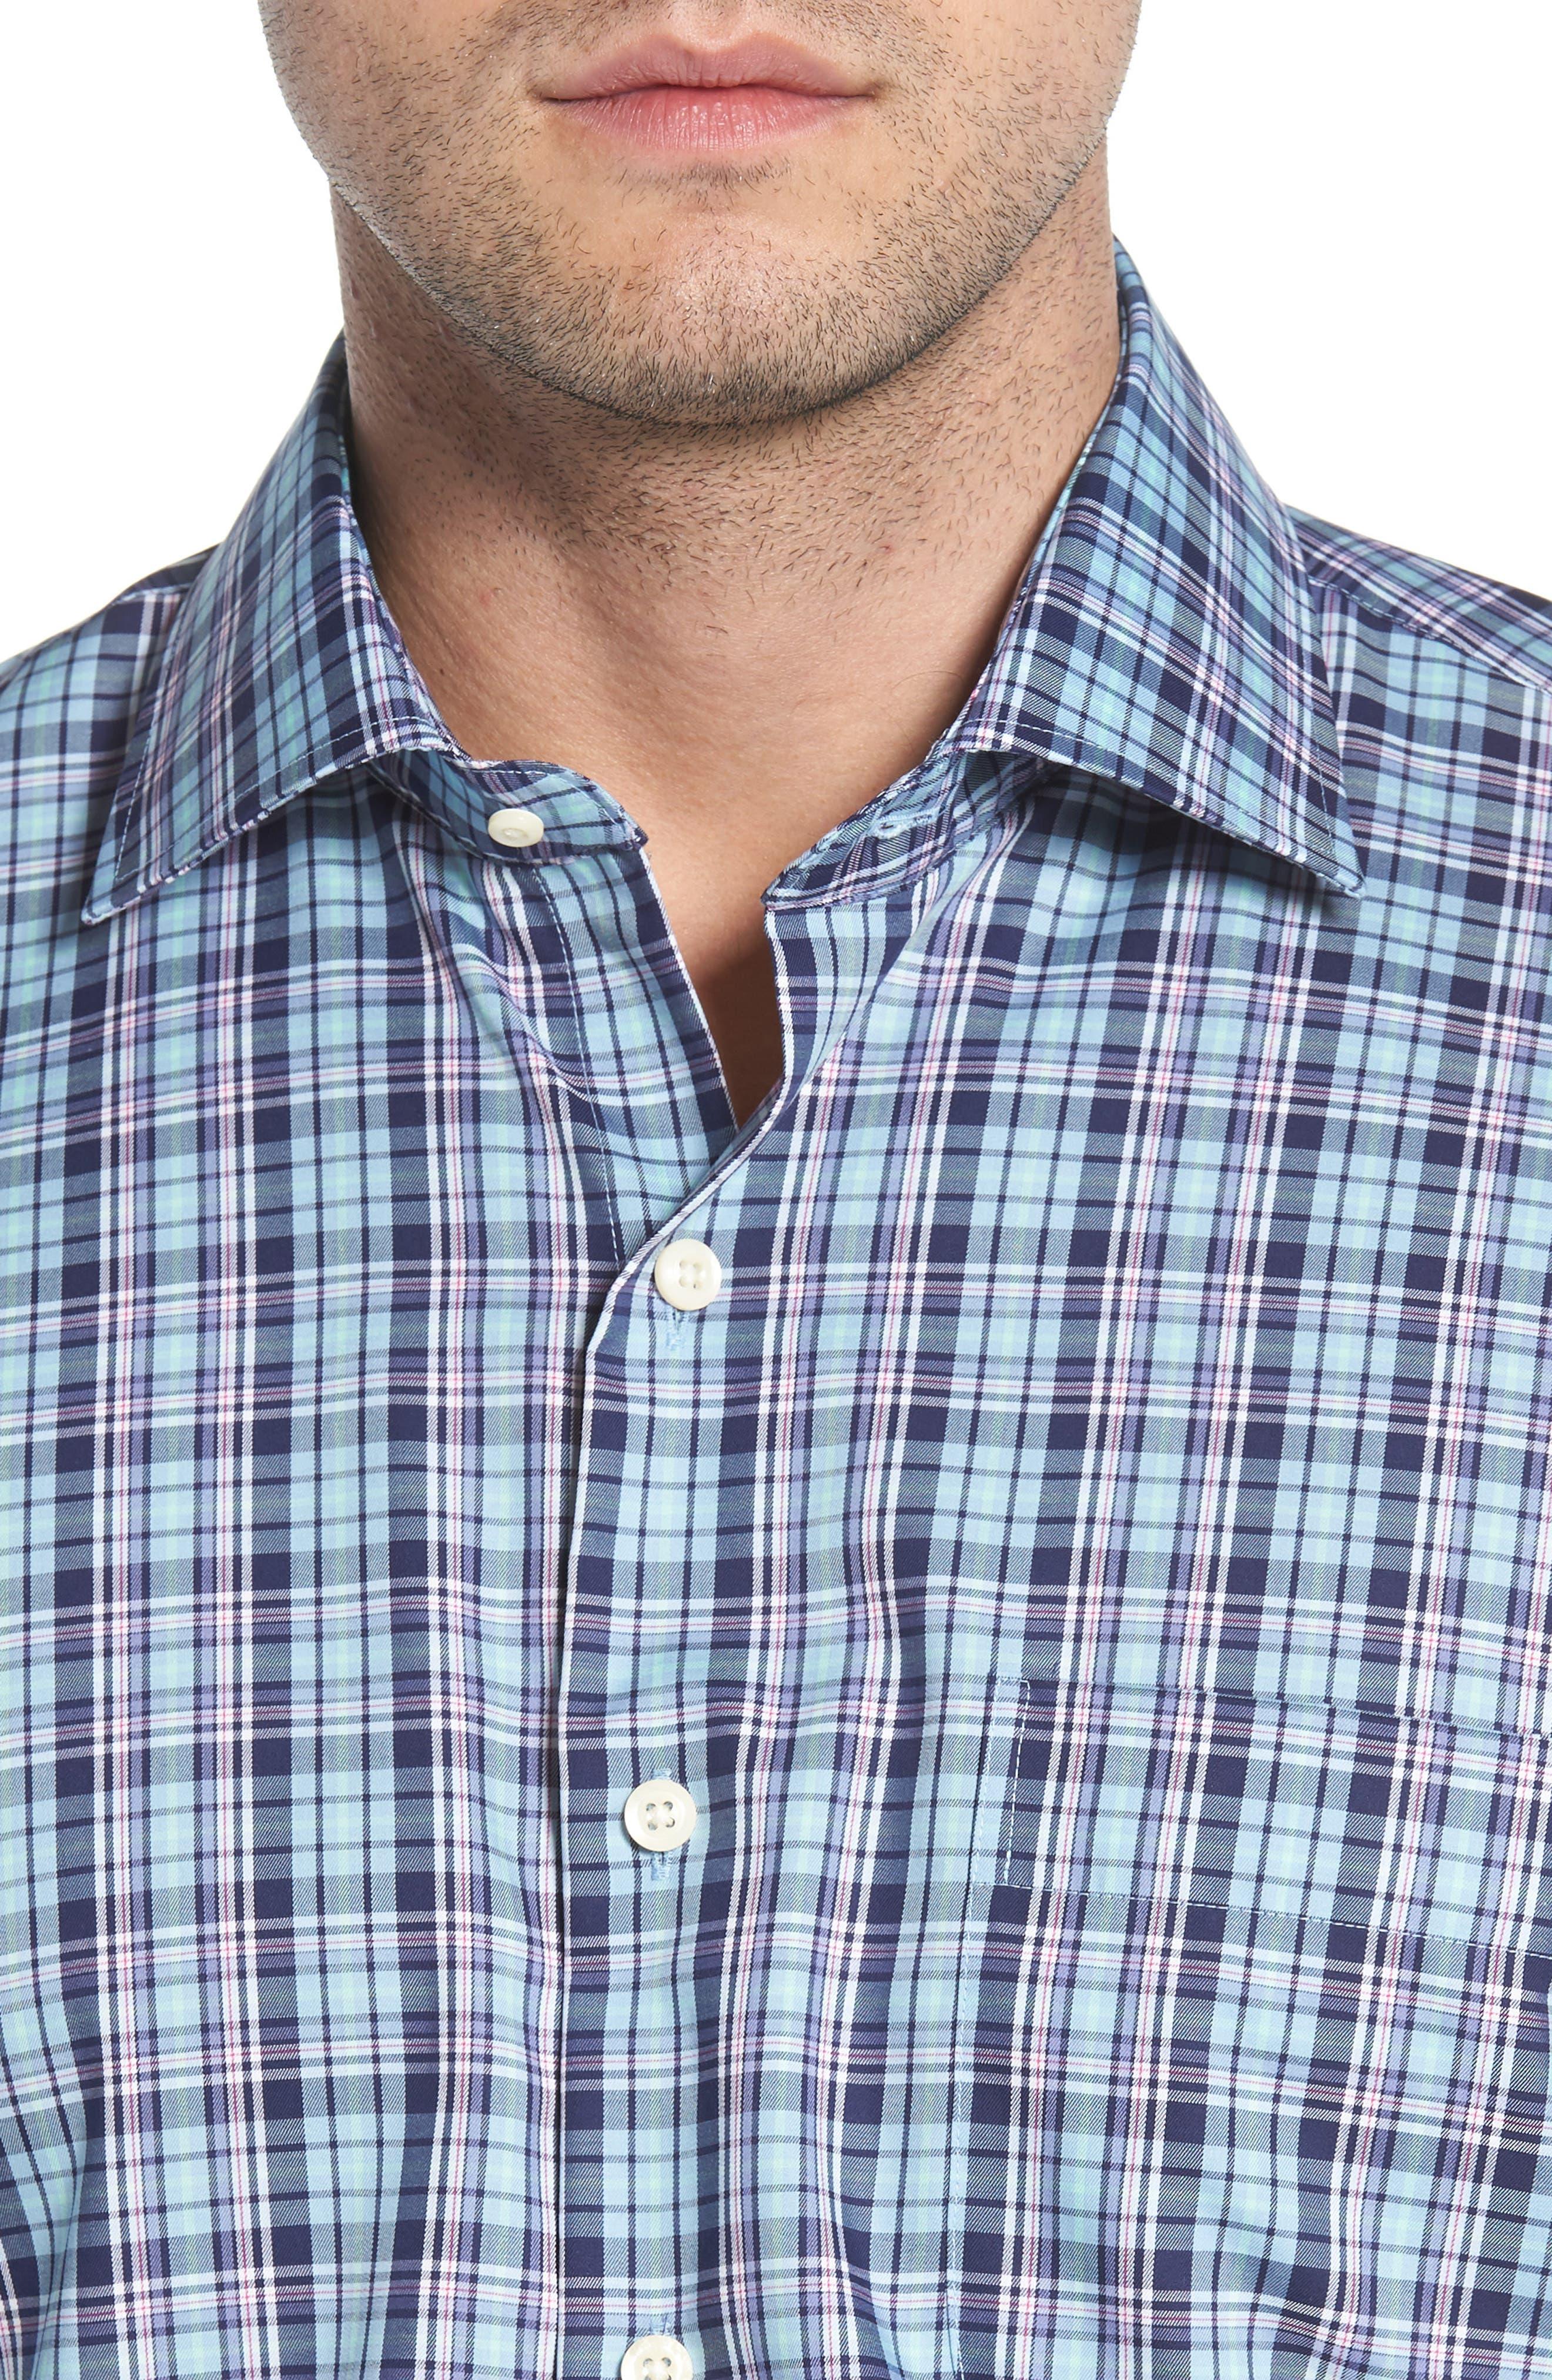 Crown Ease Laguna Plaid Sport Shirt,                             Alternate thumbnail 2, color,                             Tar Heel Blue